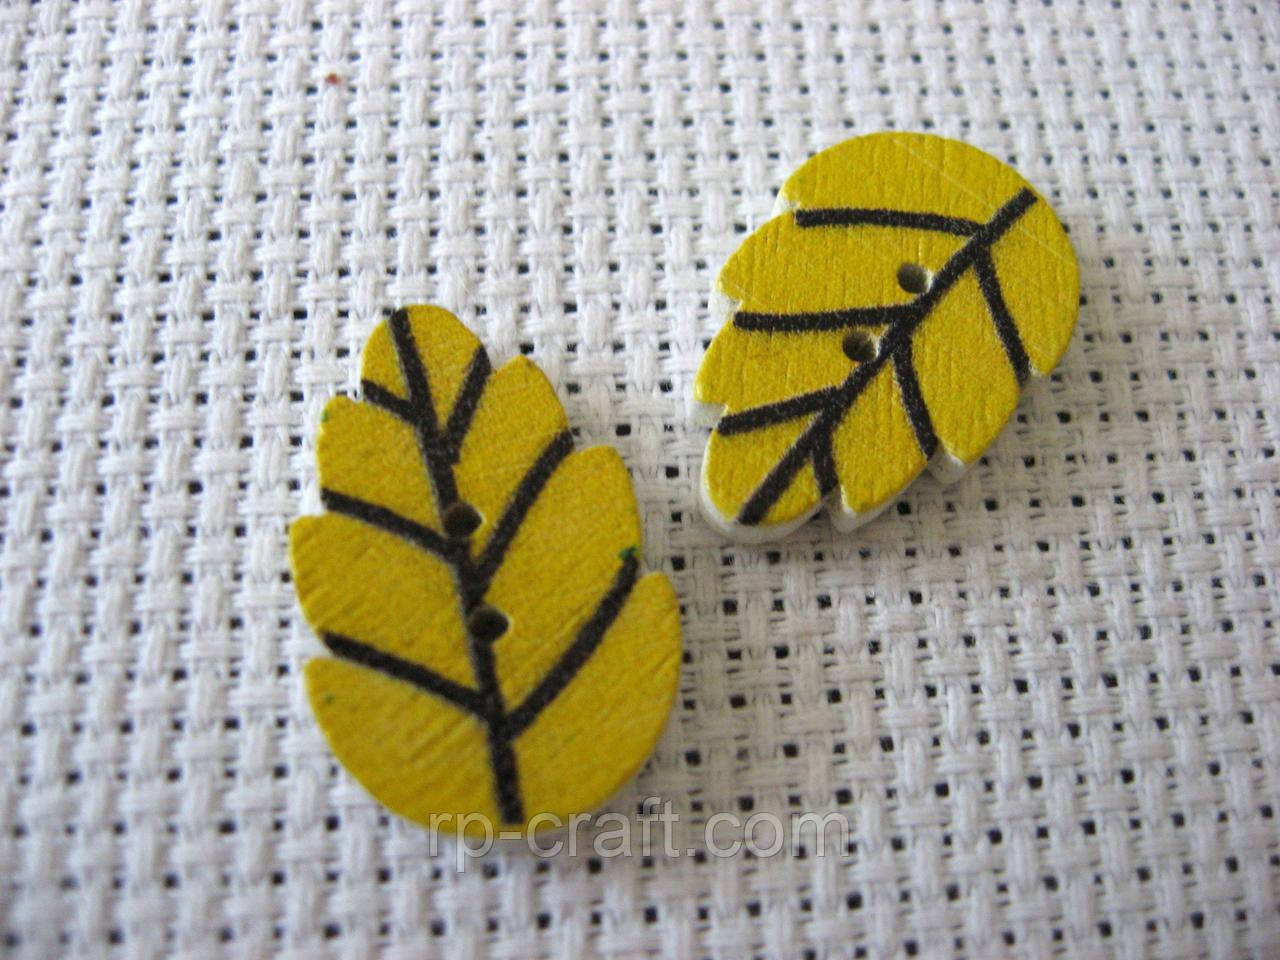 Пуговица деревянная, декоративная. Листик, желтый, 13х20 мм